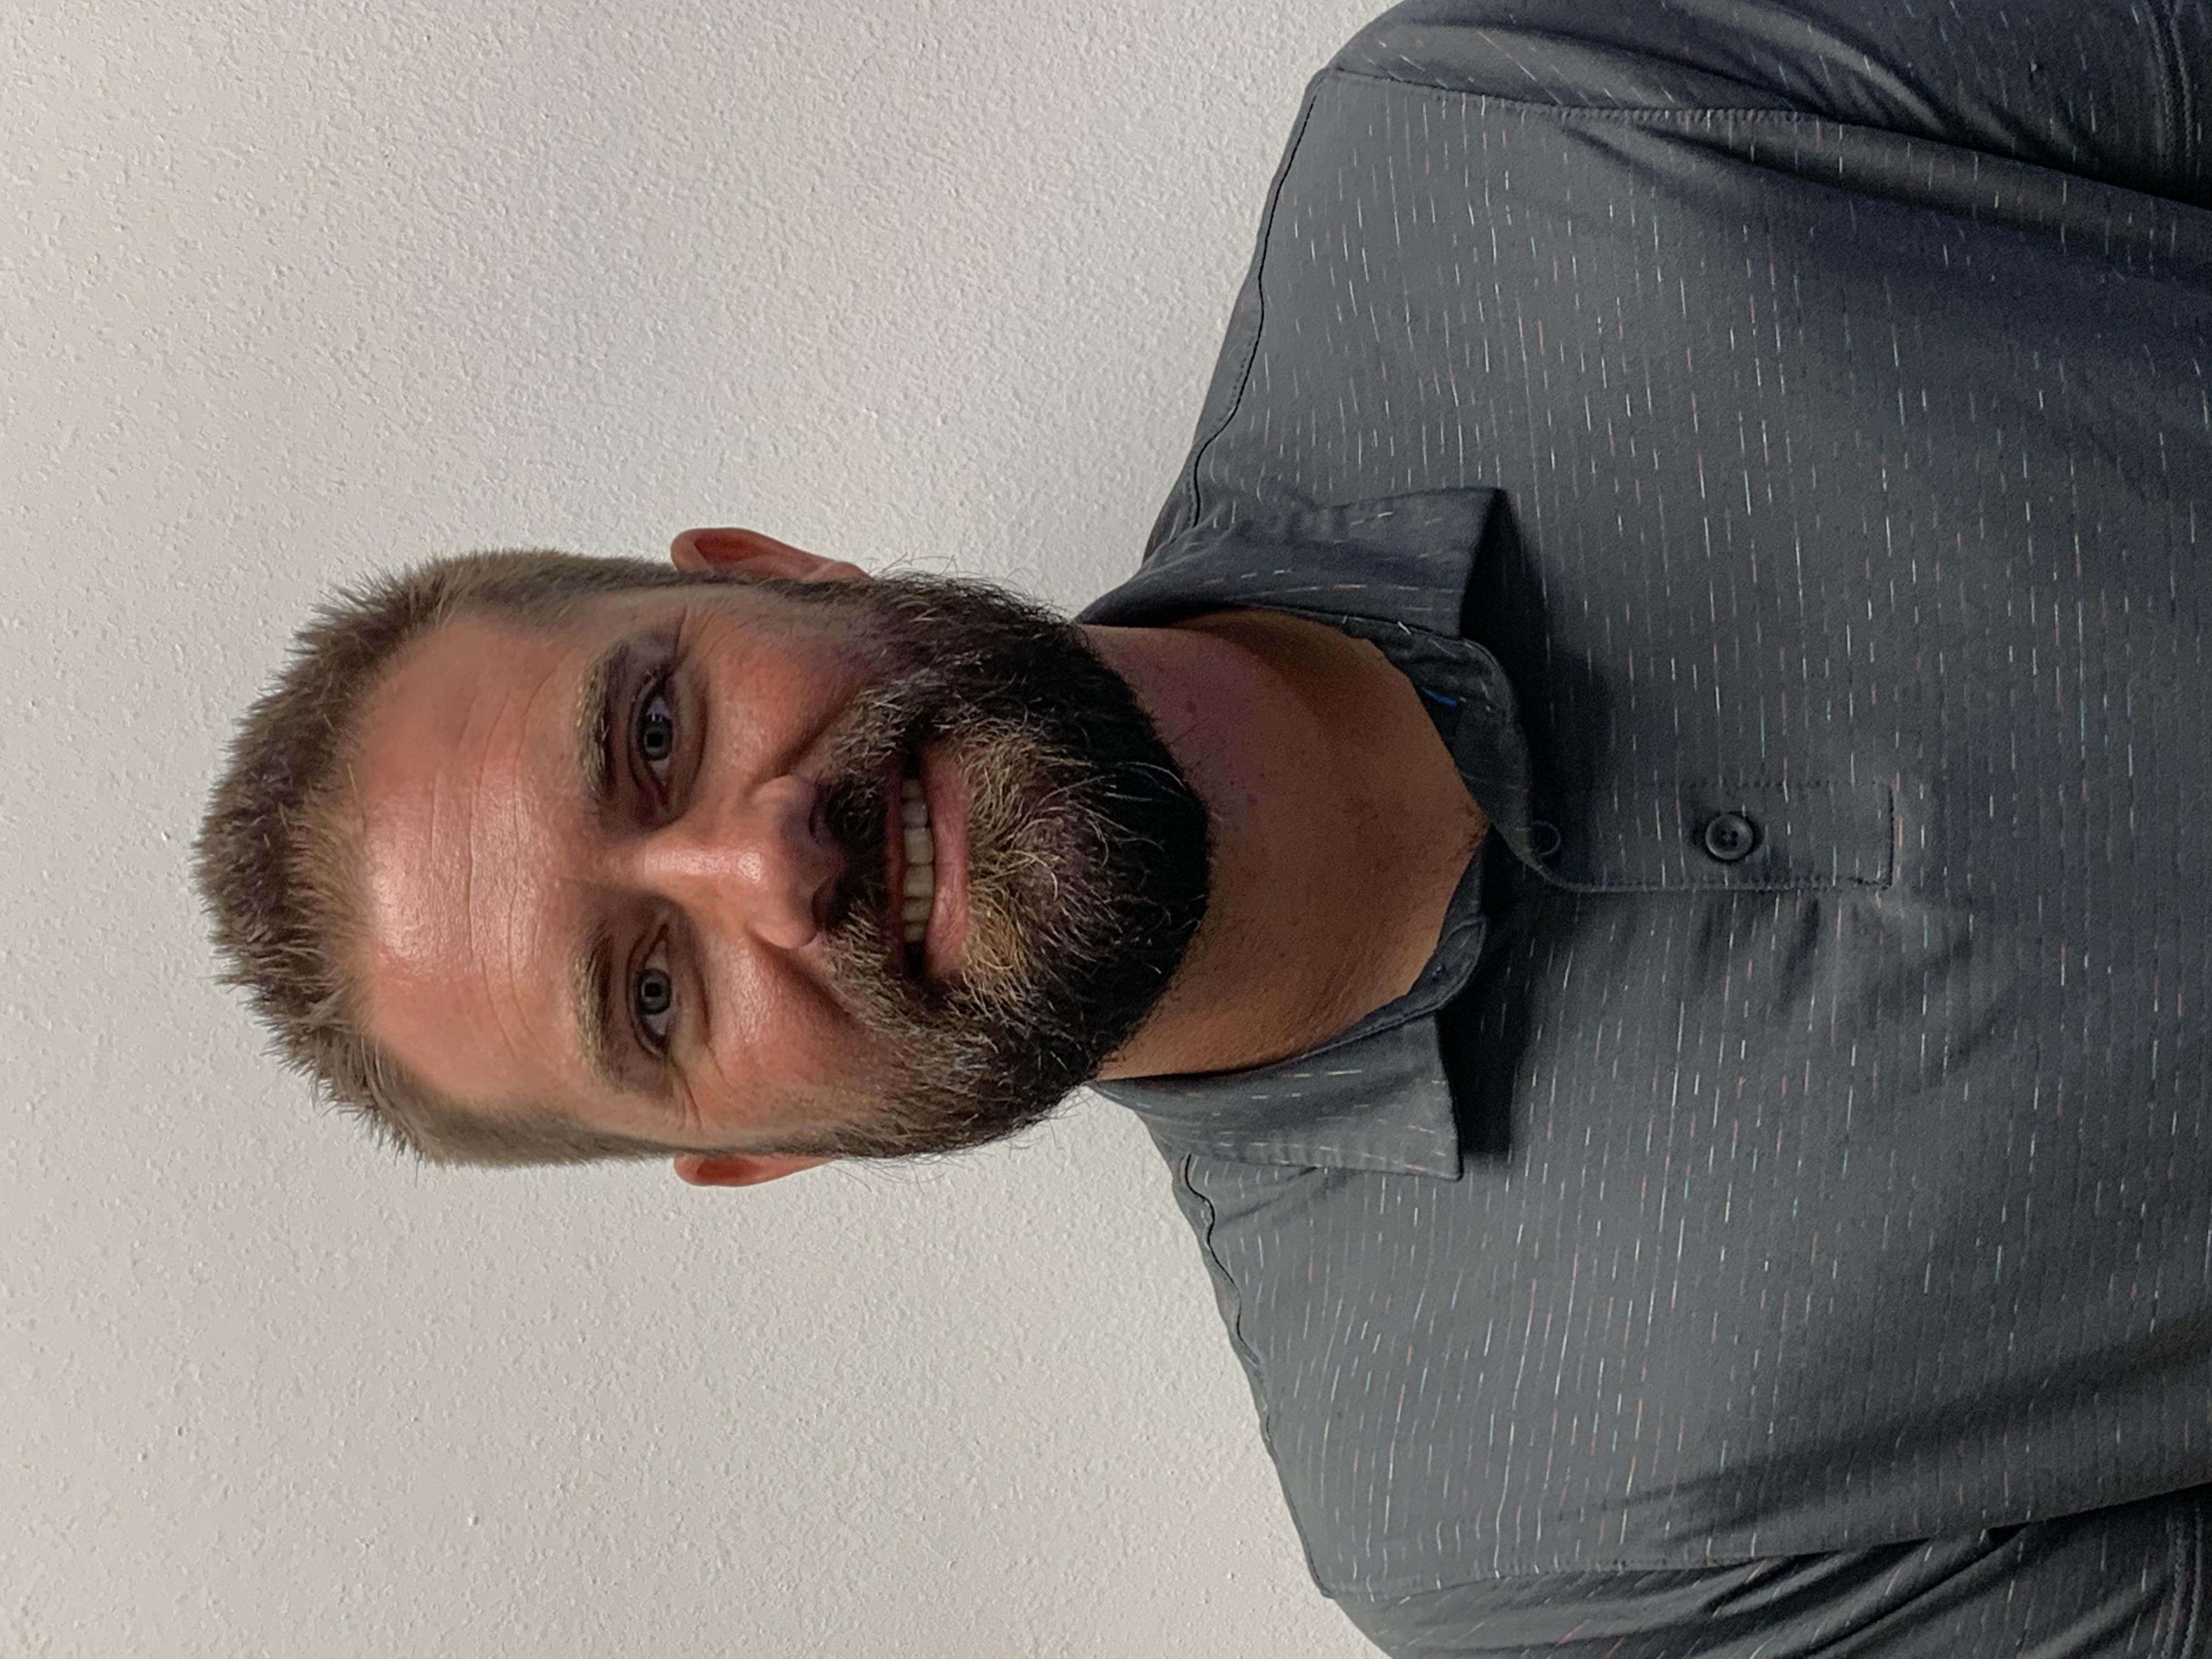 Nick Slovacek